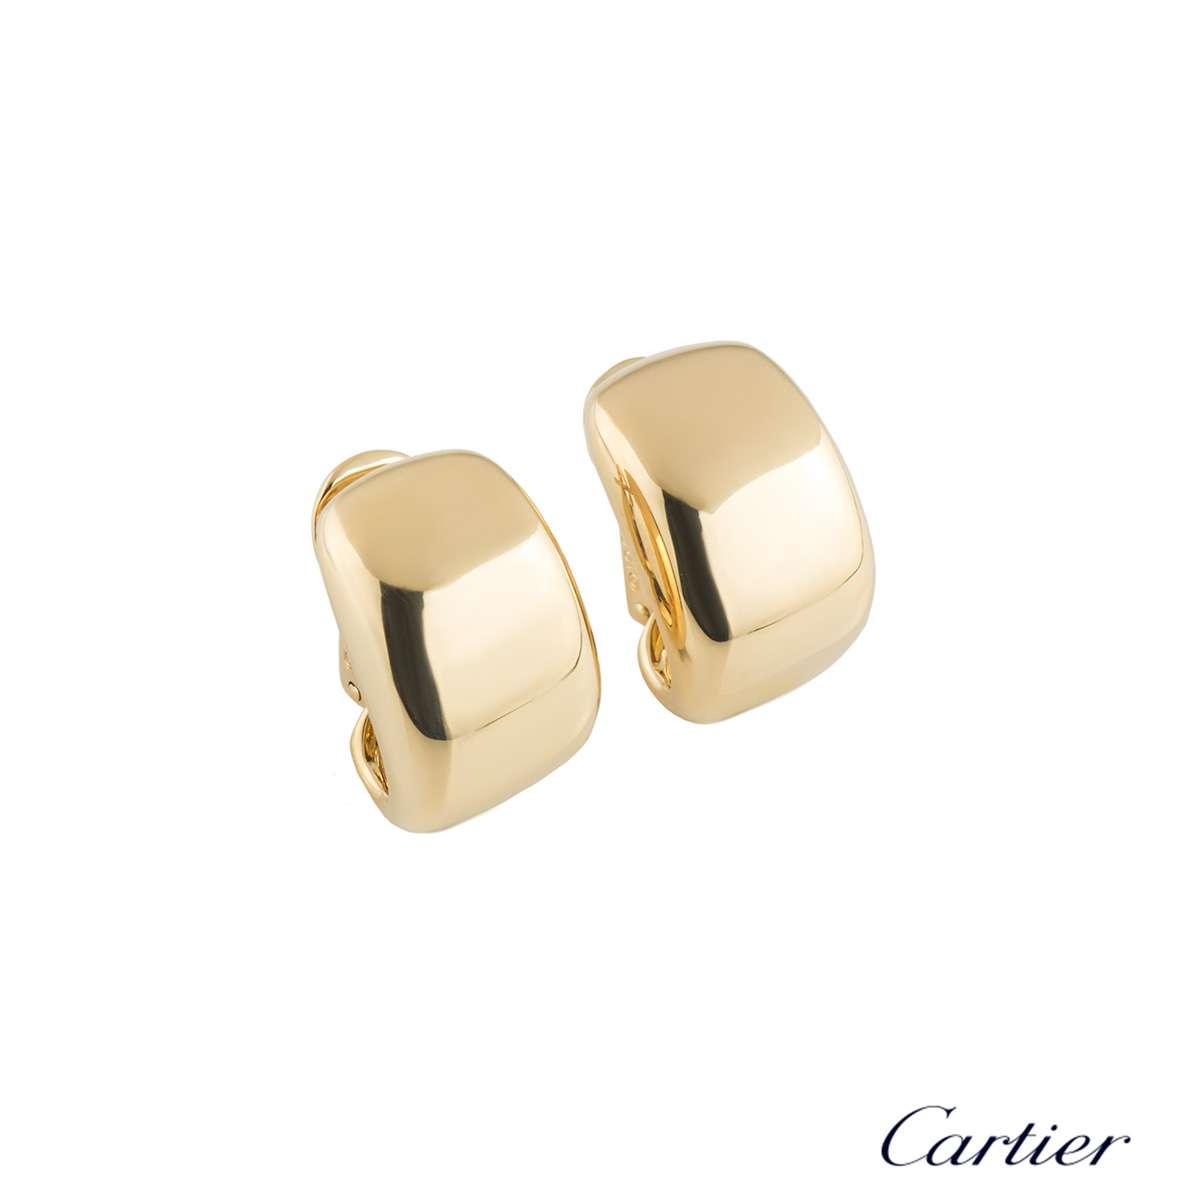 Cartier Yellow Gold Nouvelle Vague Earrings